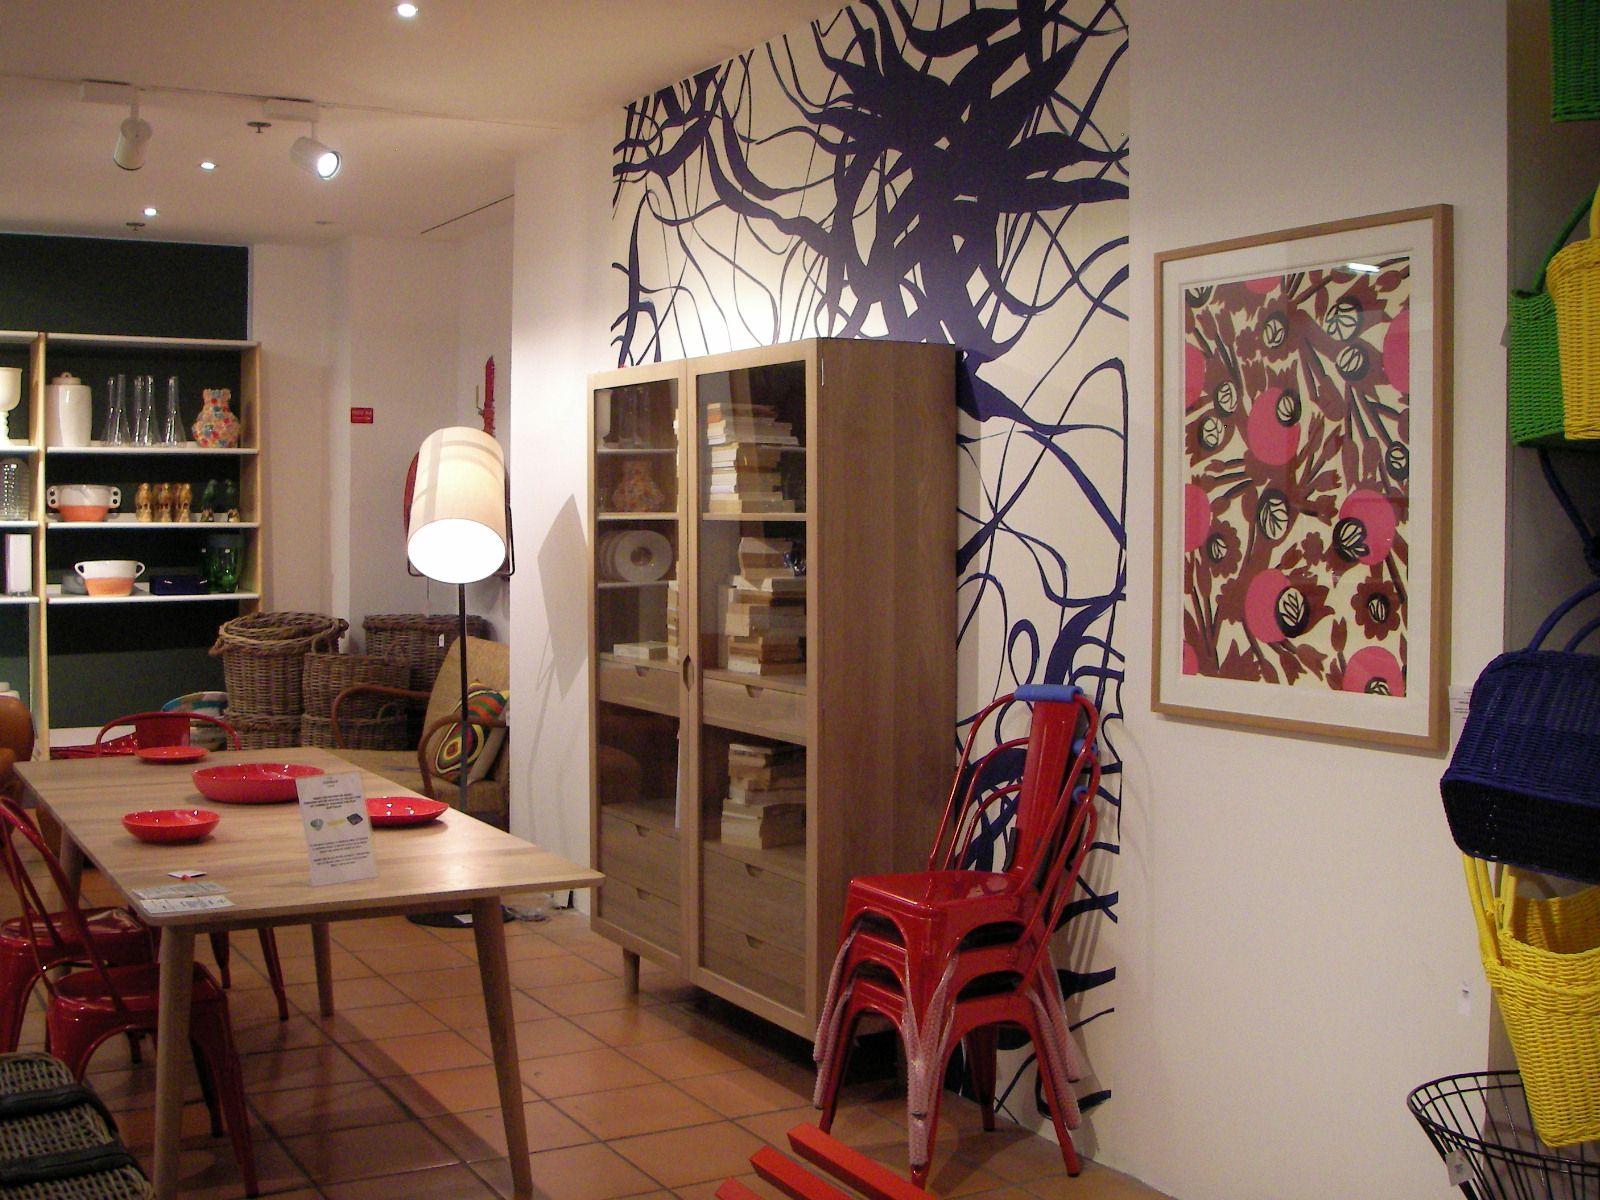 Plankeye beautiful table decor